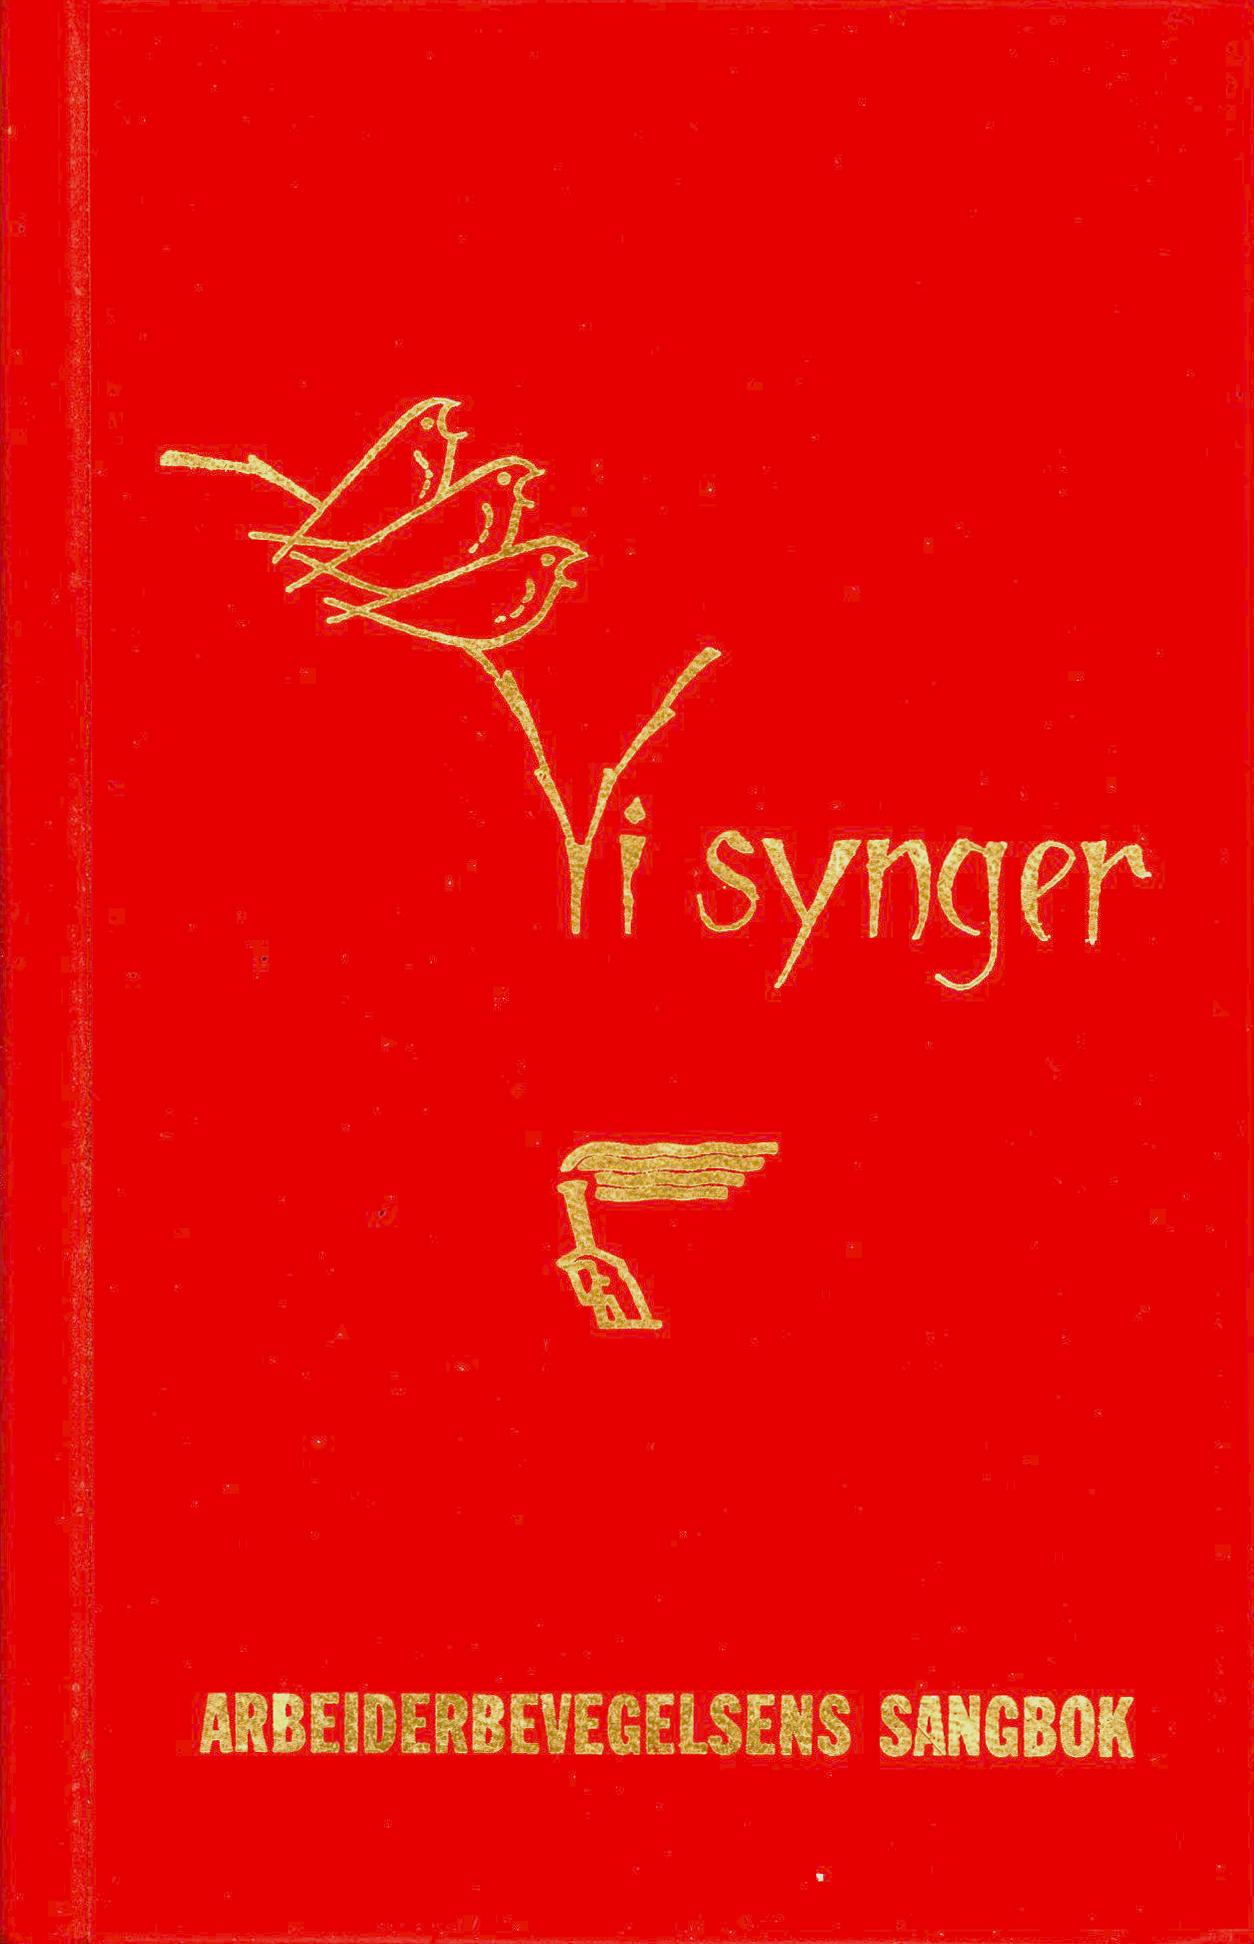 Einar Linderud (red): Vi synger - Arbeiderbevegelsens sangbok